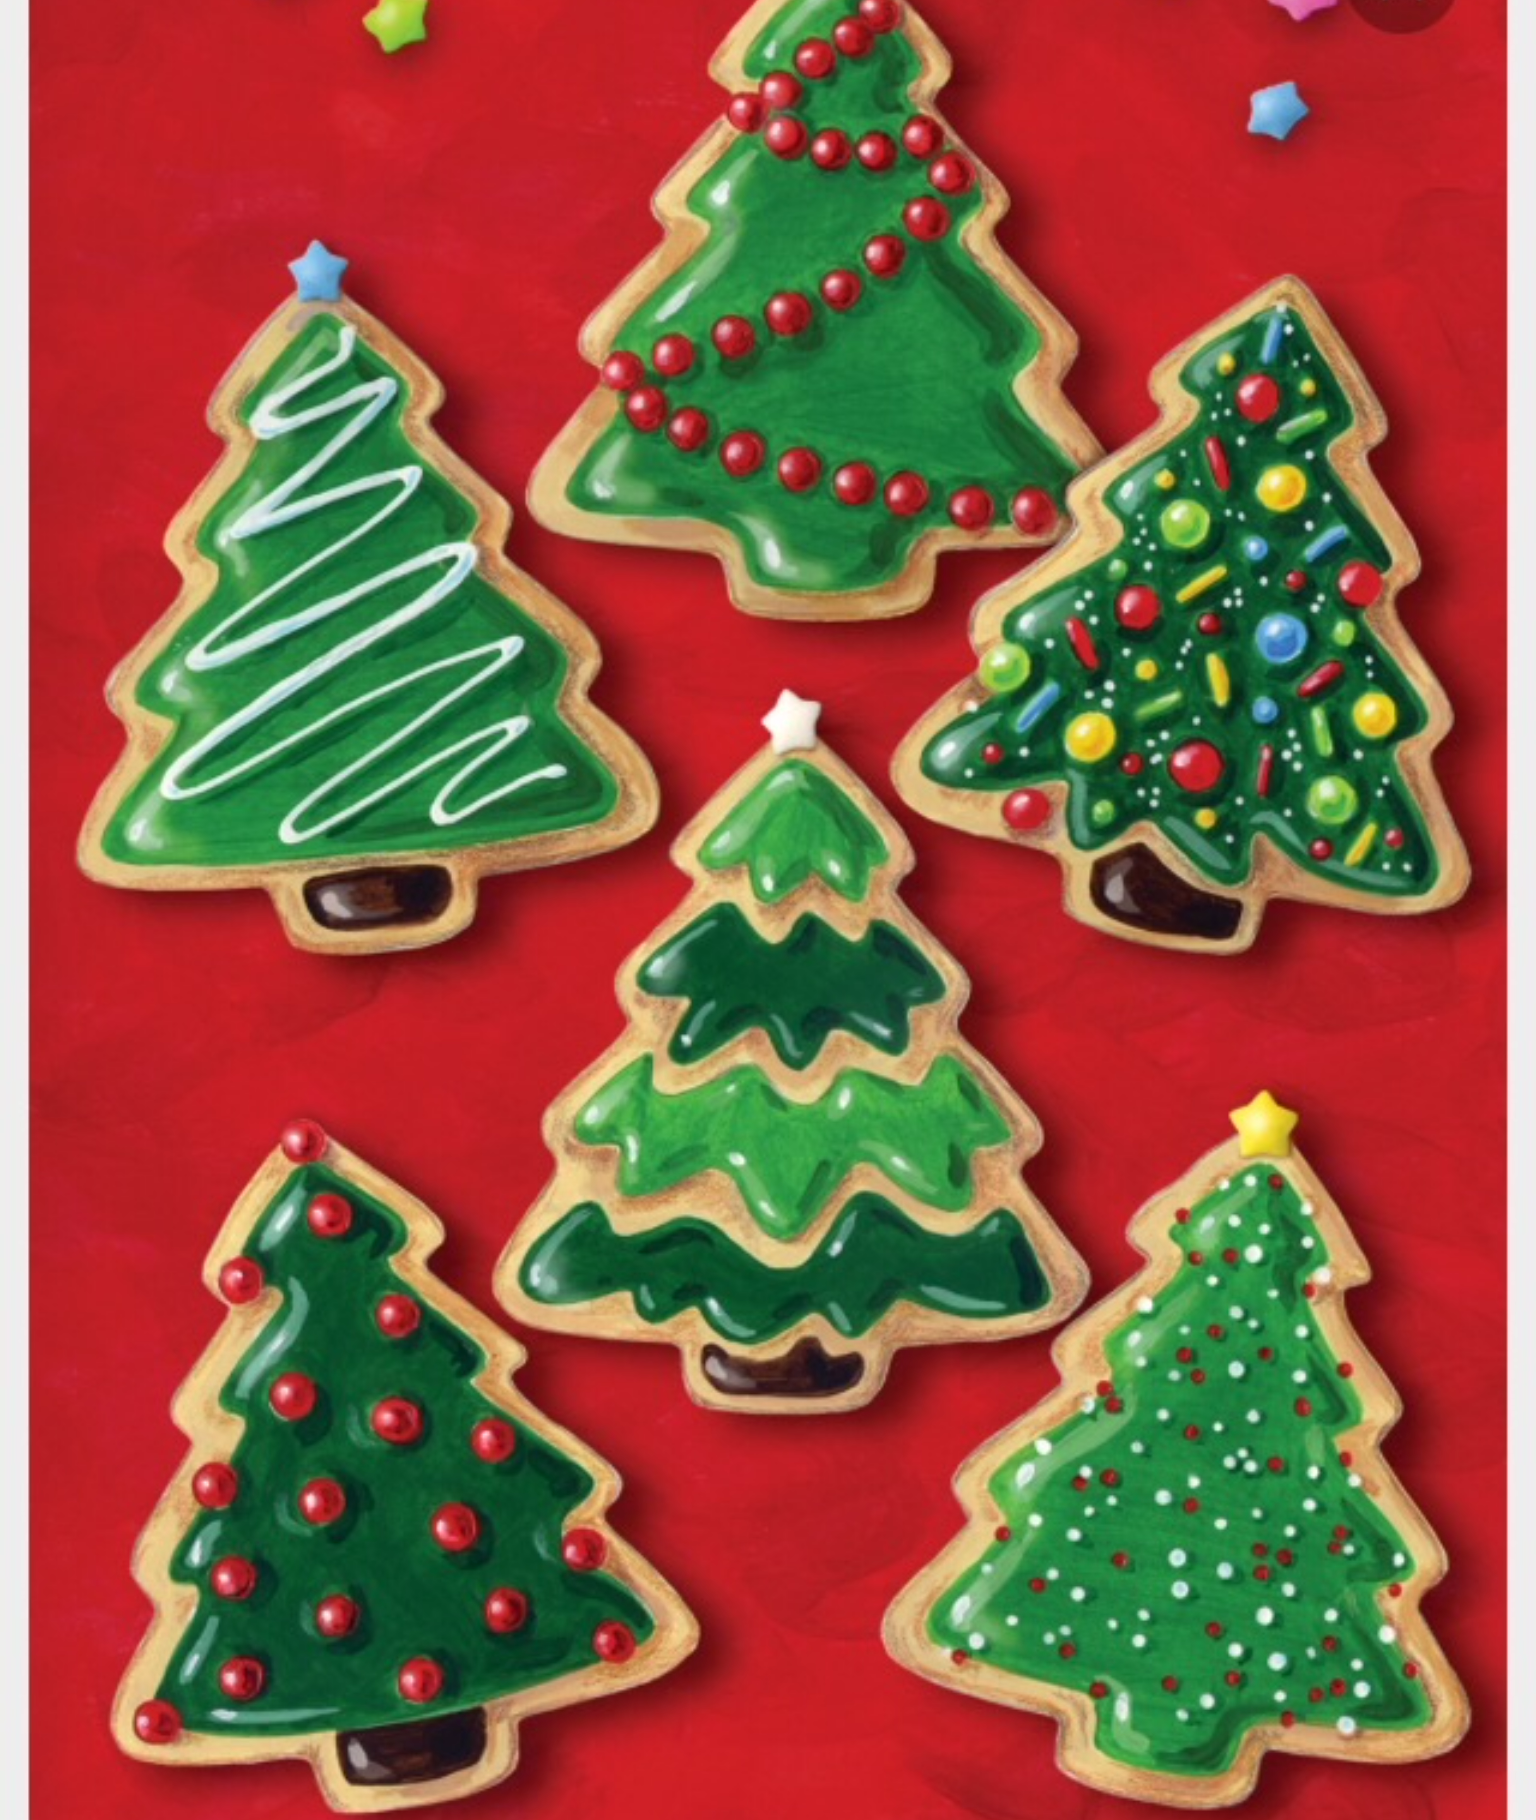 Christmas Tree Decorated Cookies: Christmas Tree Sugar Cookie Decorating